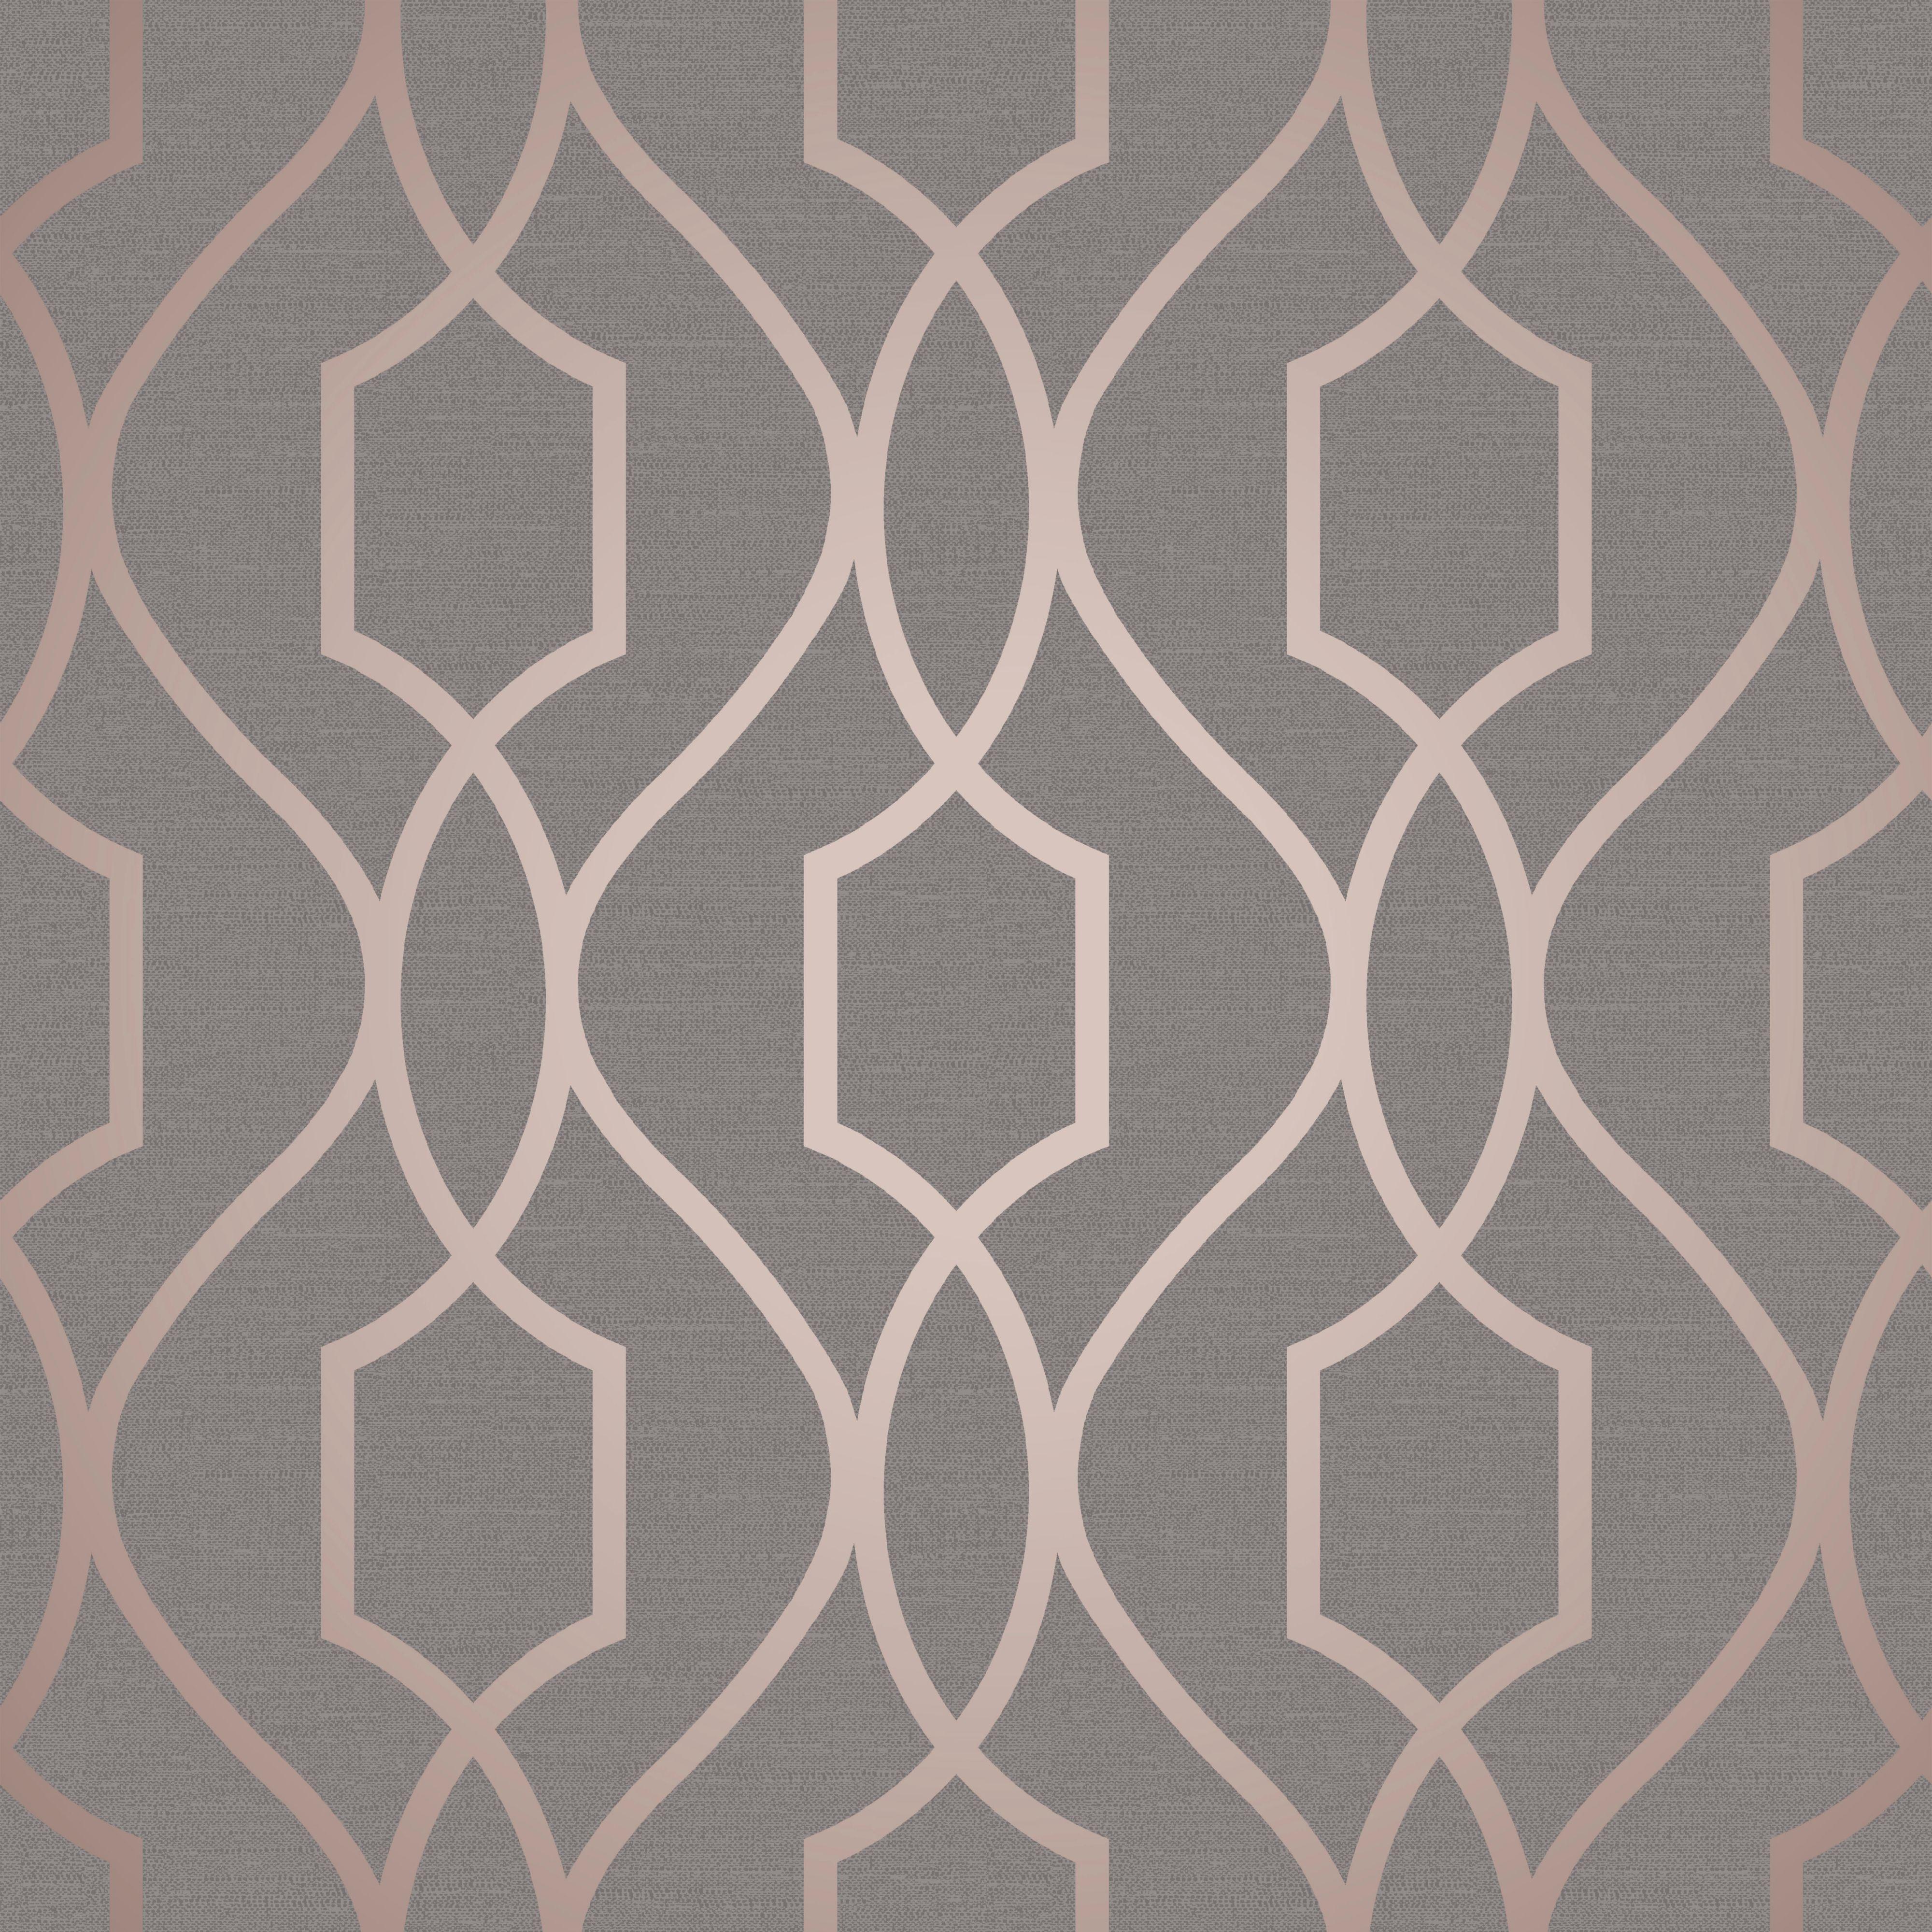 Fine Decor Grey Copper Effect Geometric Textured Wallpaper